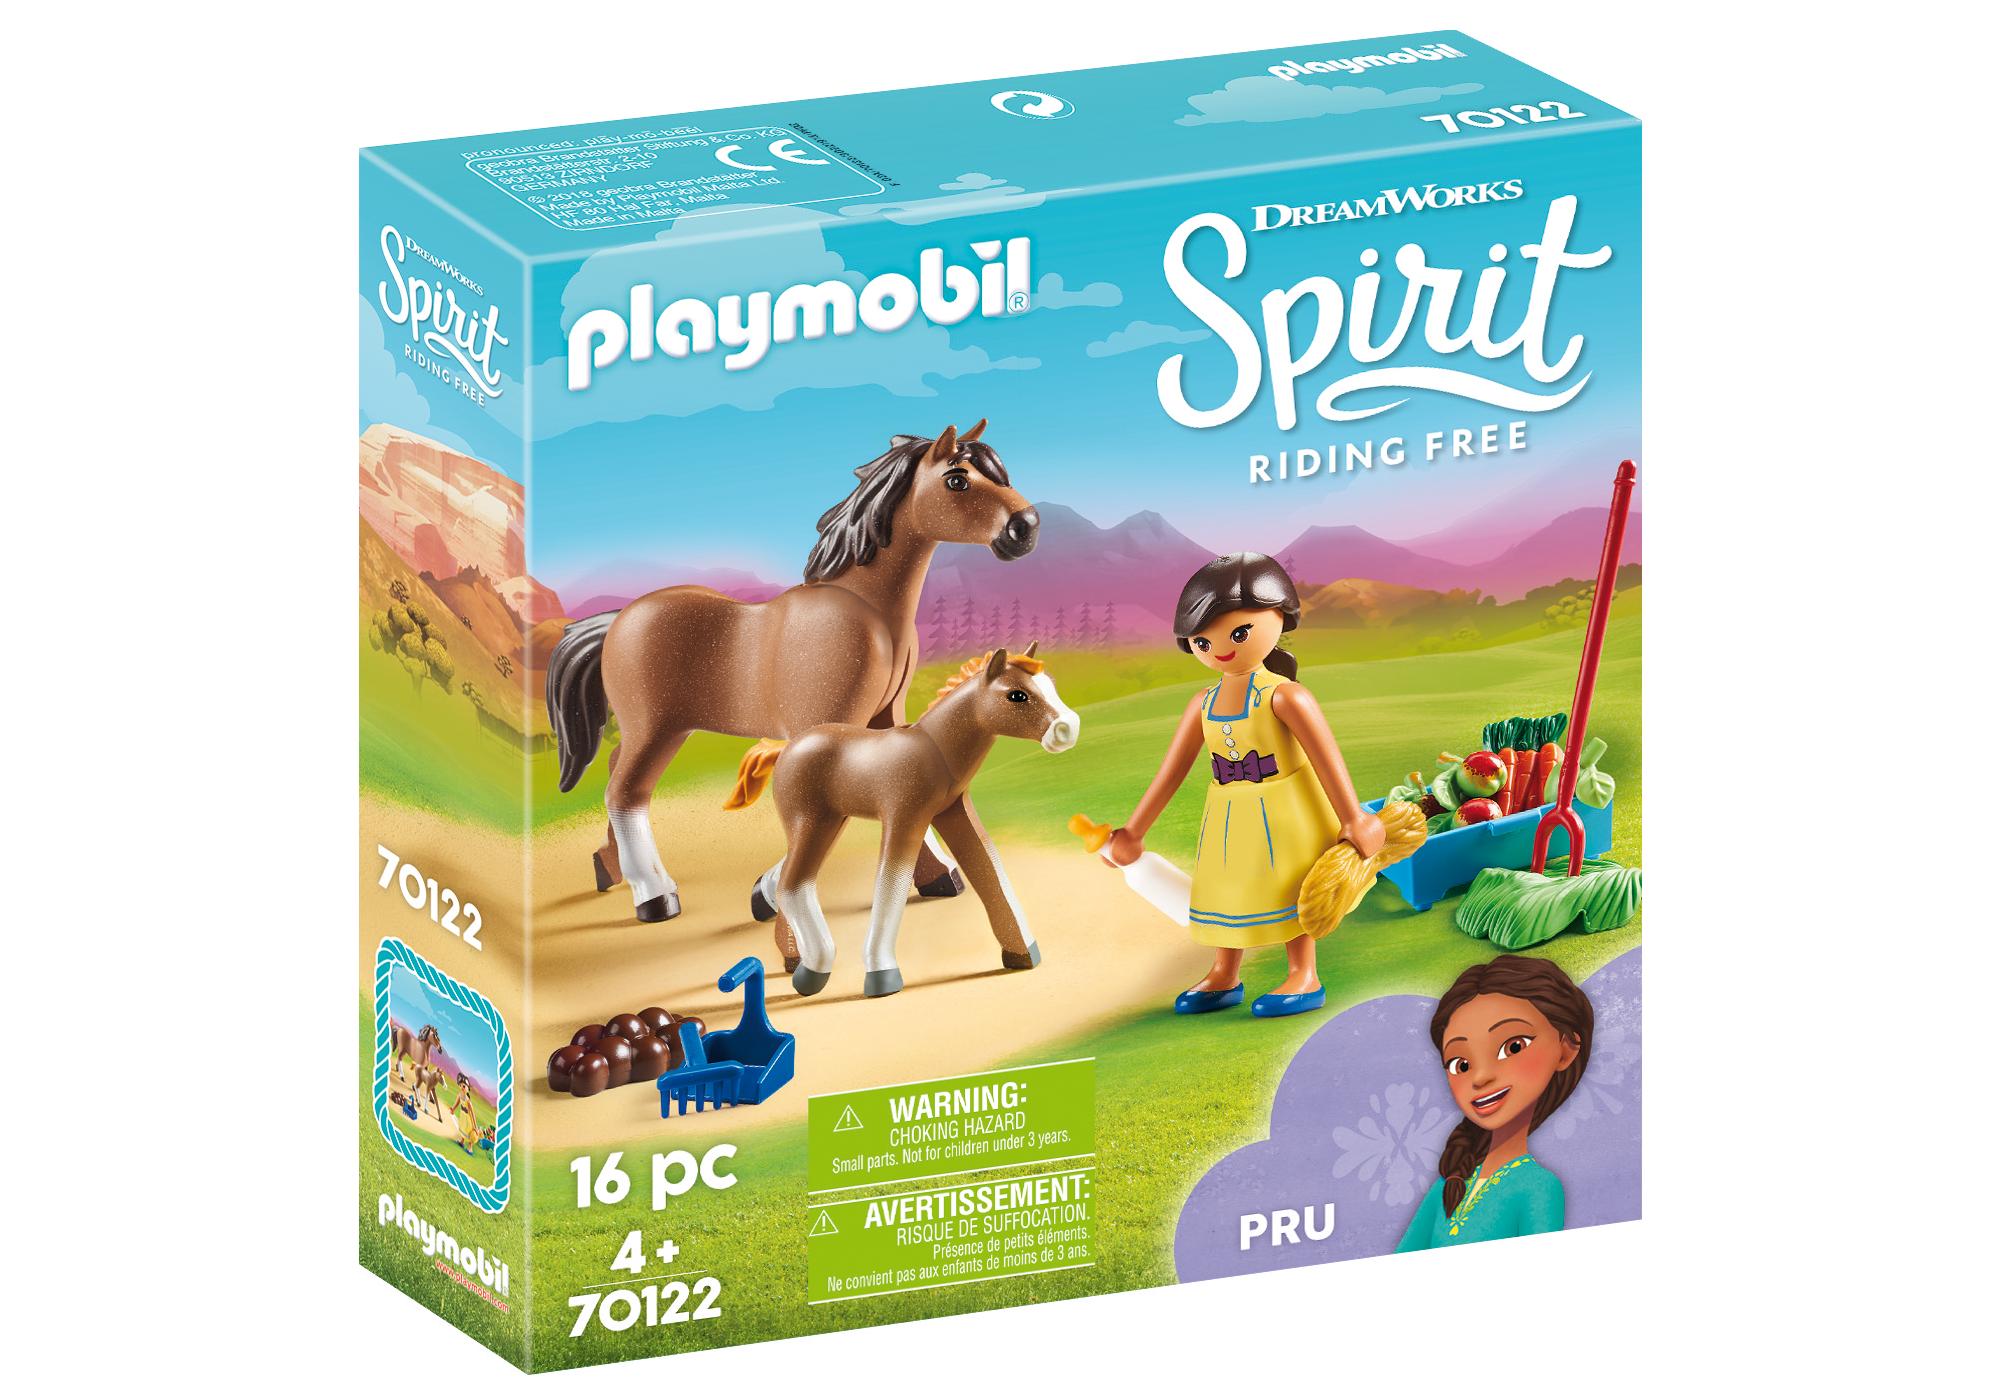 http://media.playmobil.com/i/playmobil/70122_product_box_front/Pru mit Pferd und Fohlen